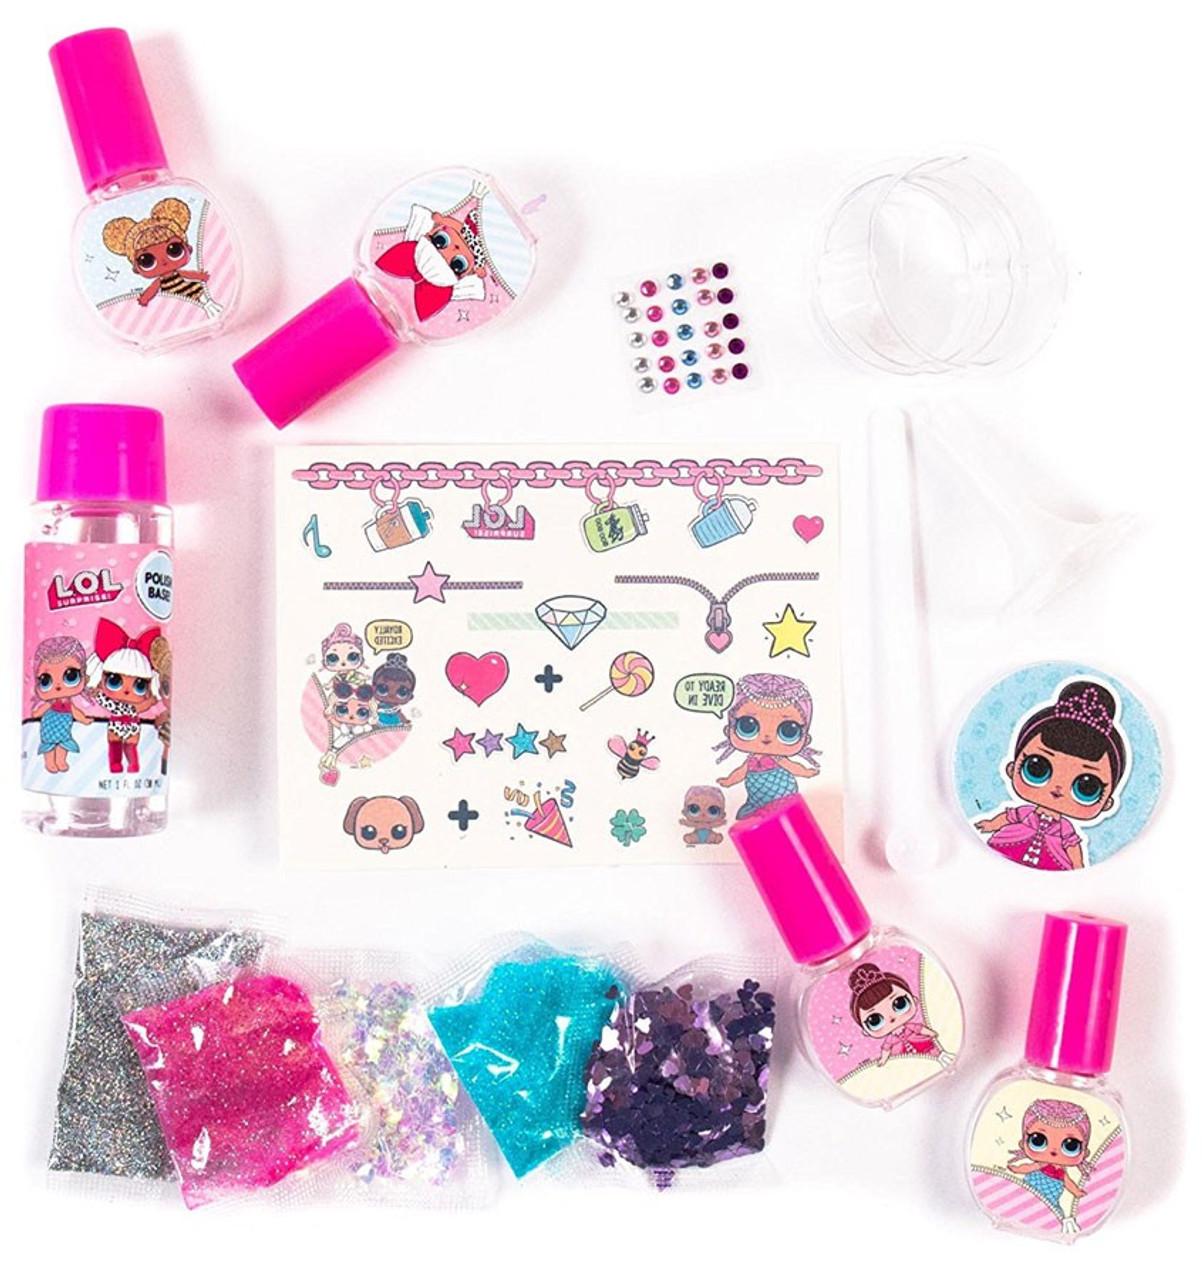 LOL Surprise Confetti Nail Art MGA Entertainment - ToyWiz